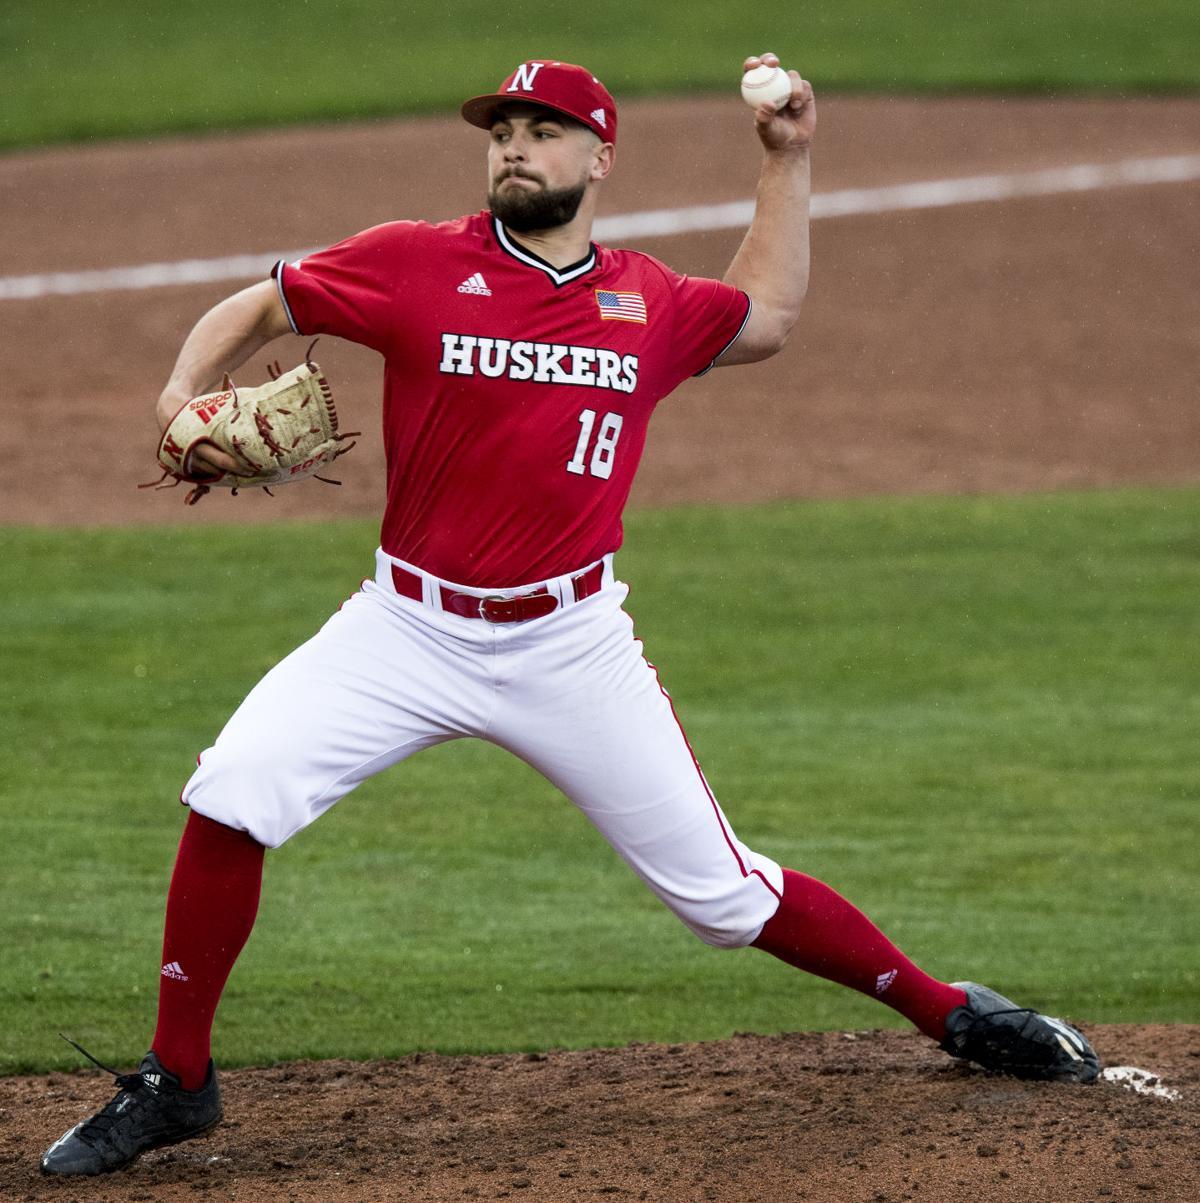 Creighton vs. Nebraska baseball, 4/24